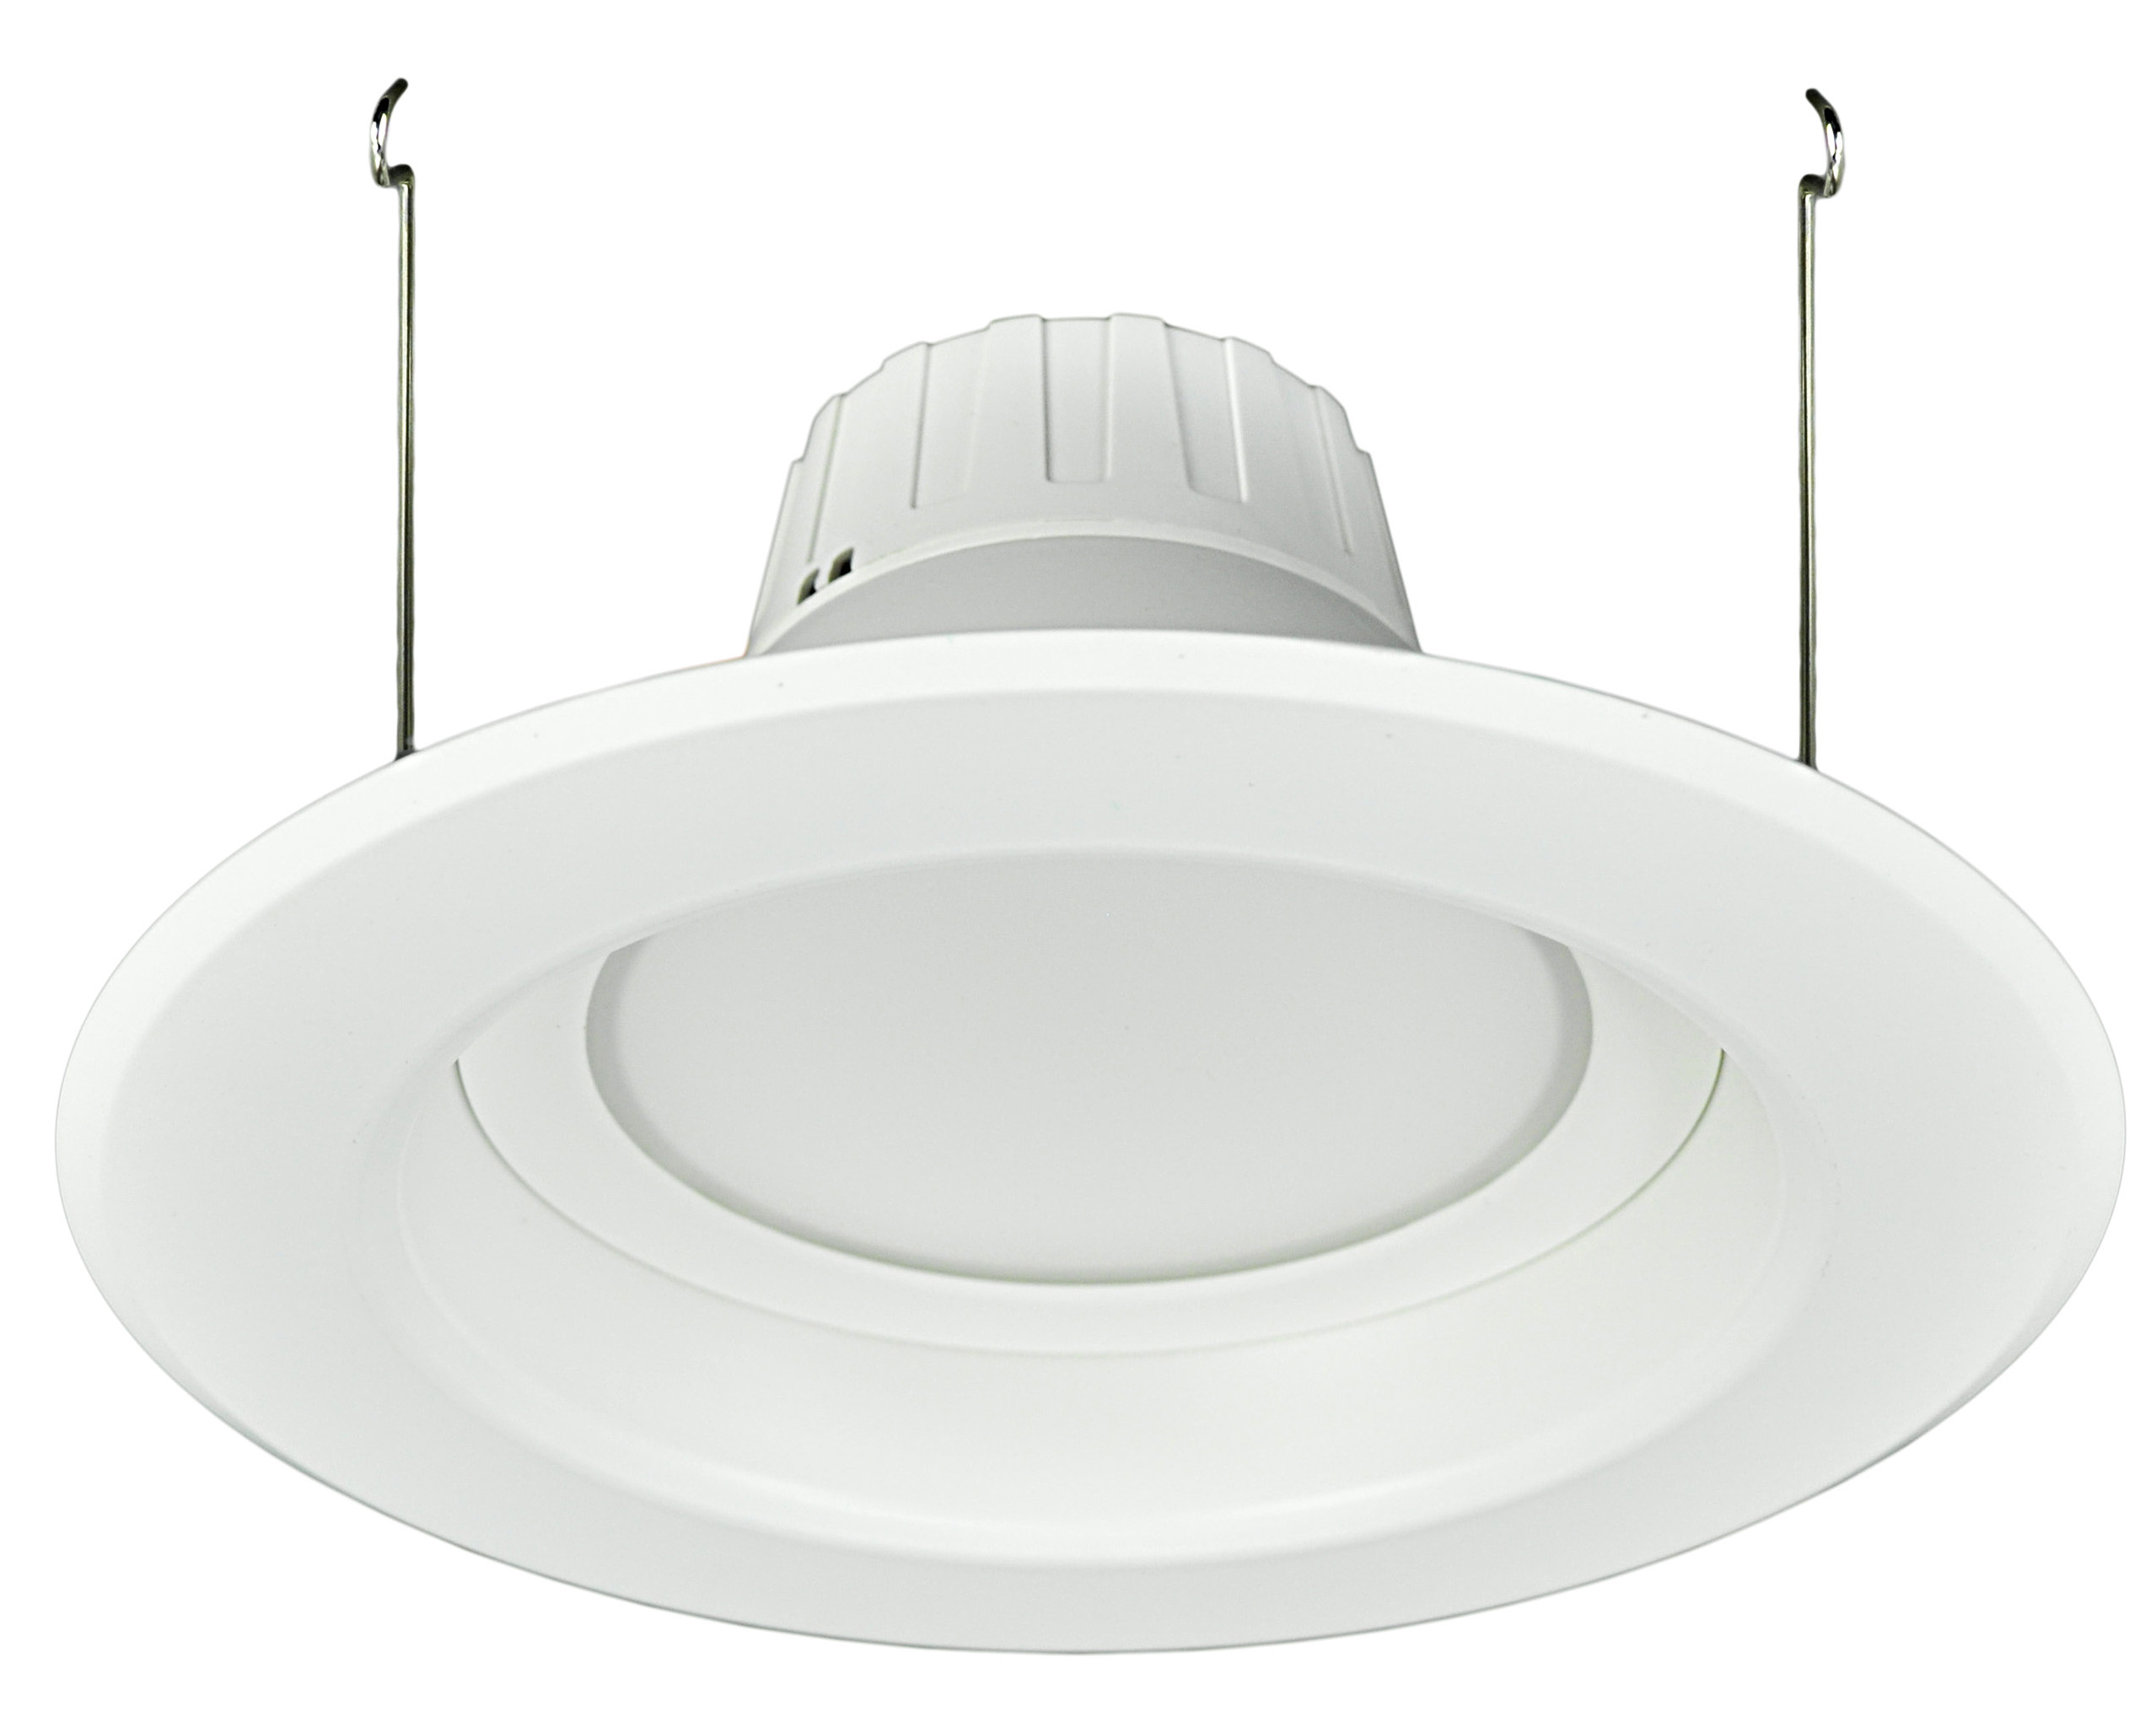 lighting lighting led 6 dimmable led retrofit recessed down light 13. Black Bedroom Furniture Sets. Home Design Ideas